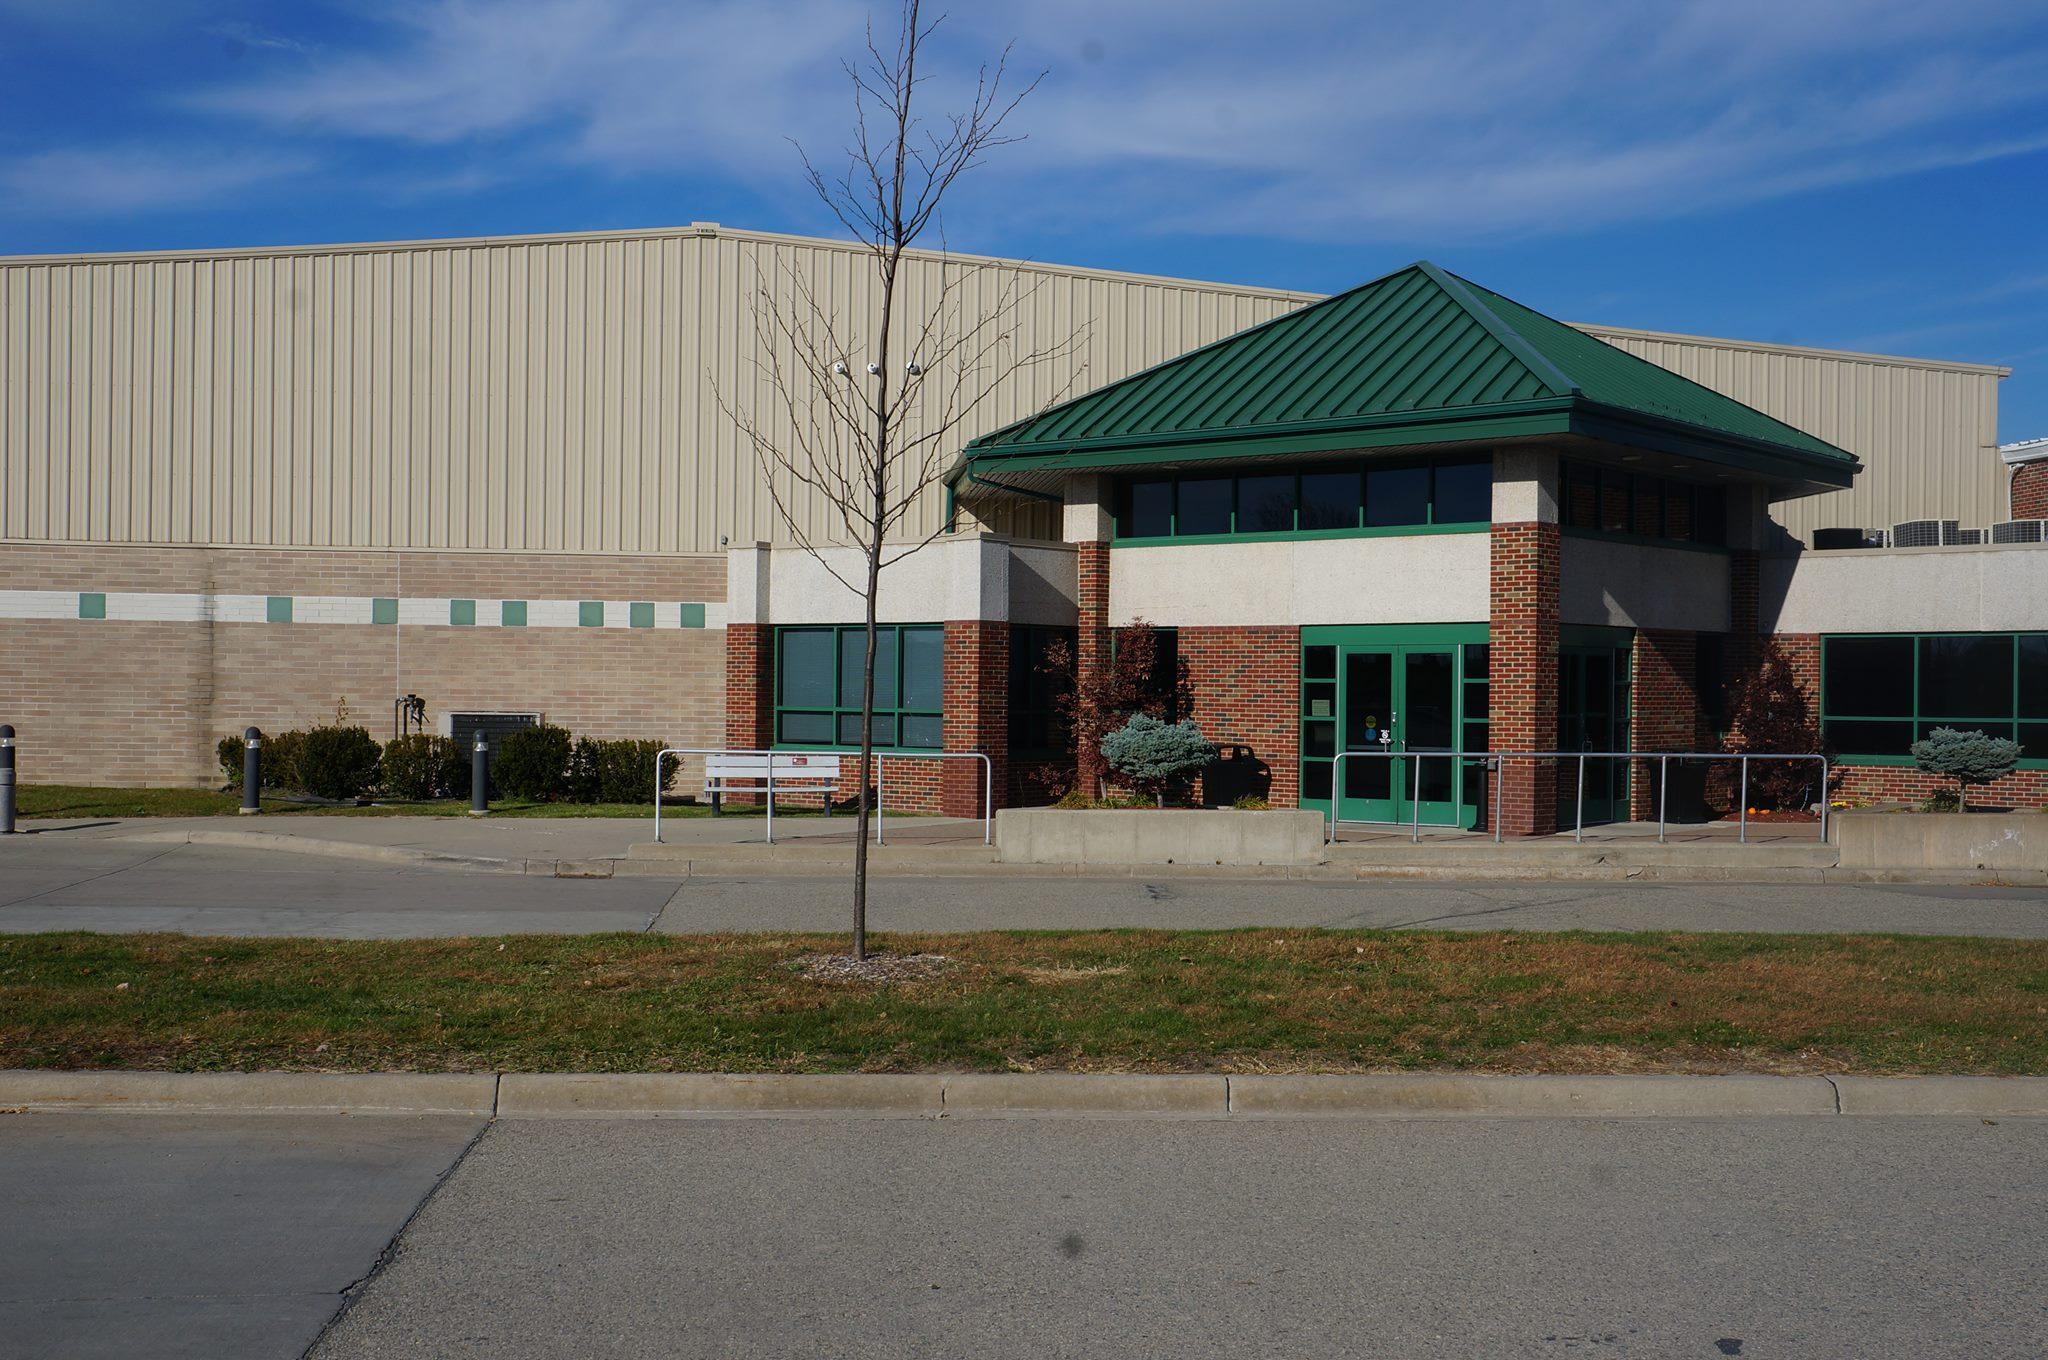 Southgate Civic Arena